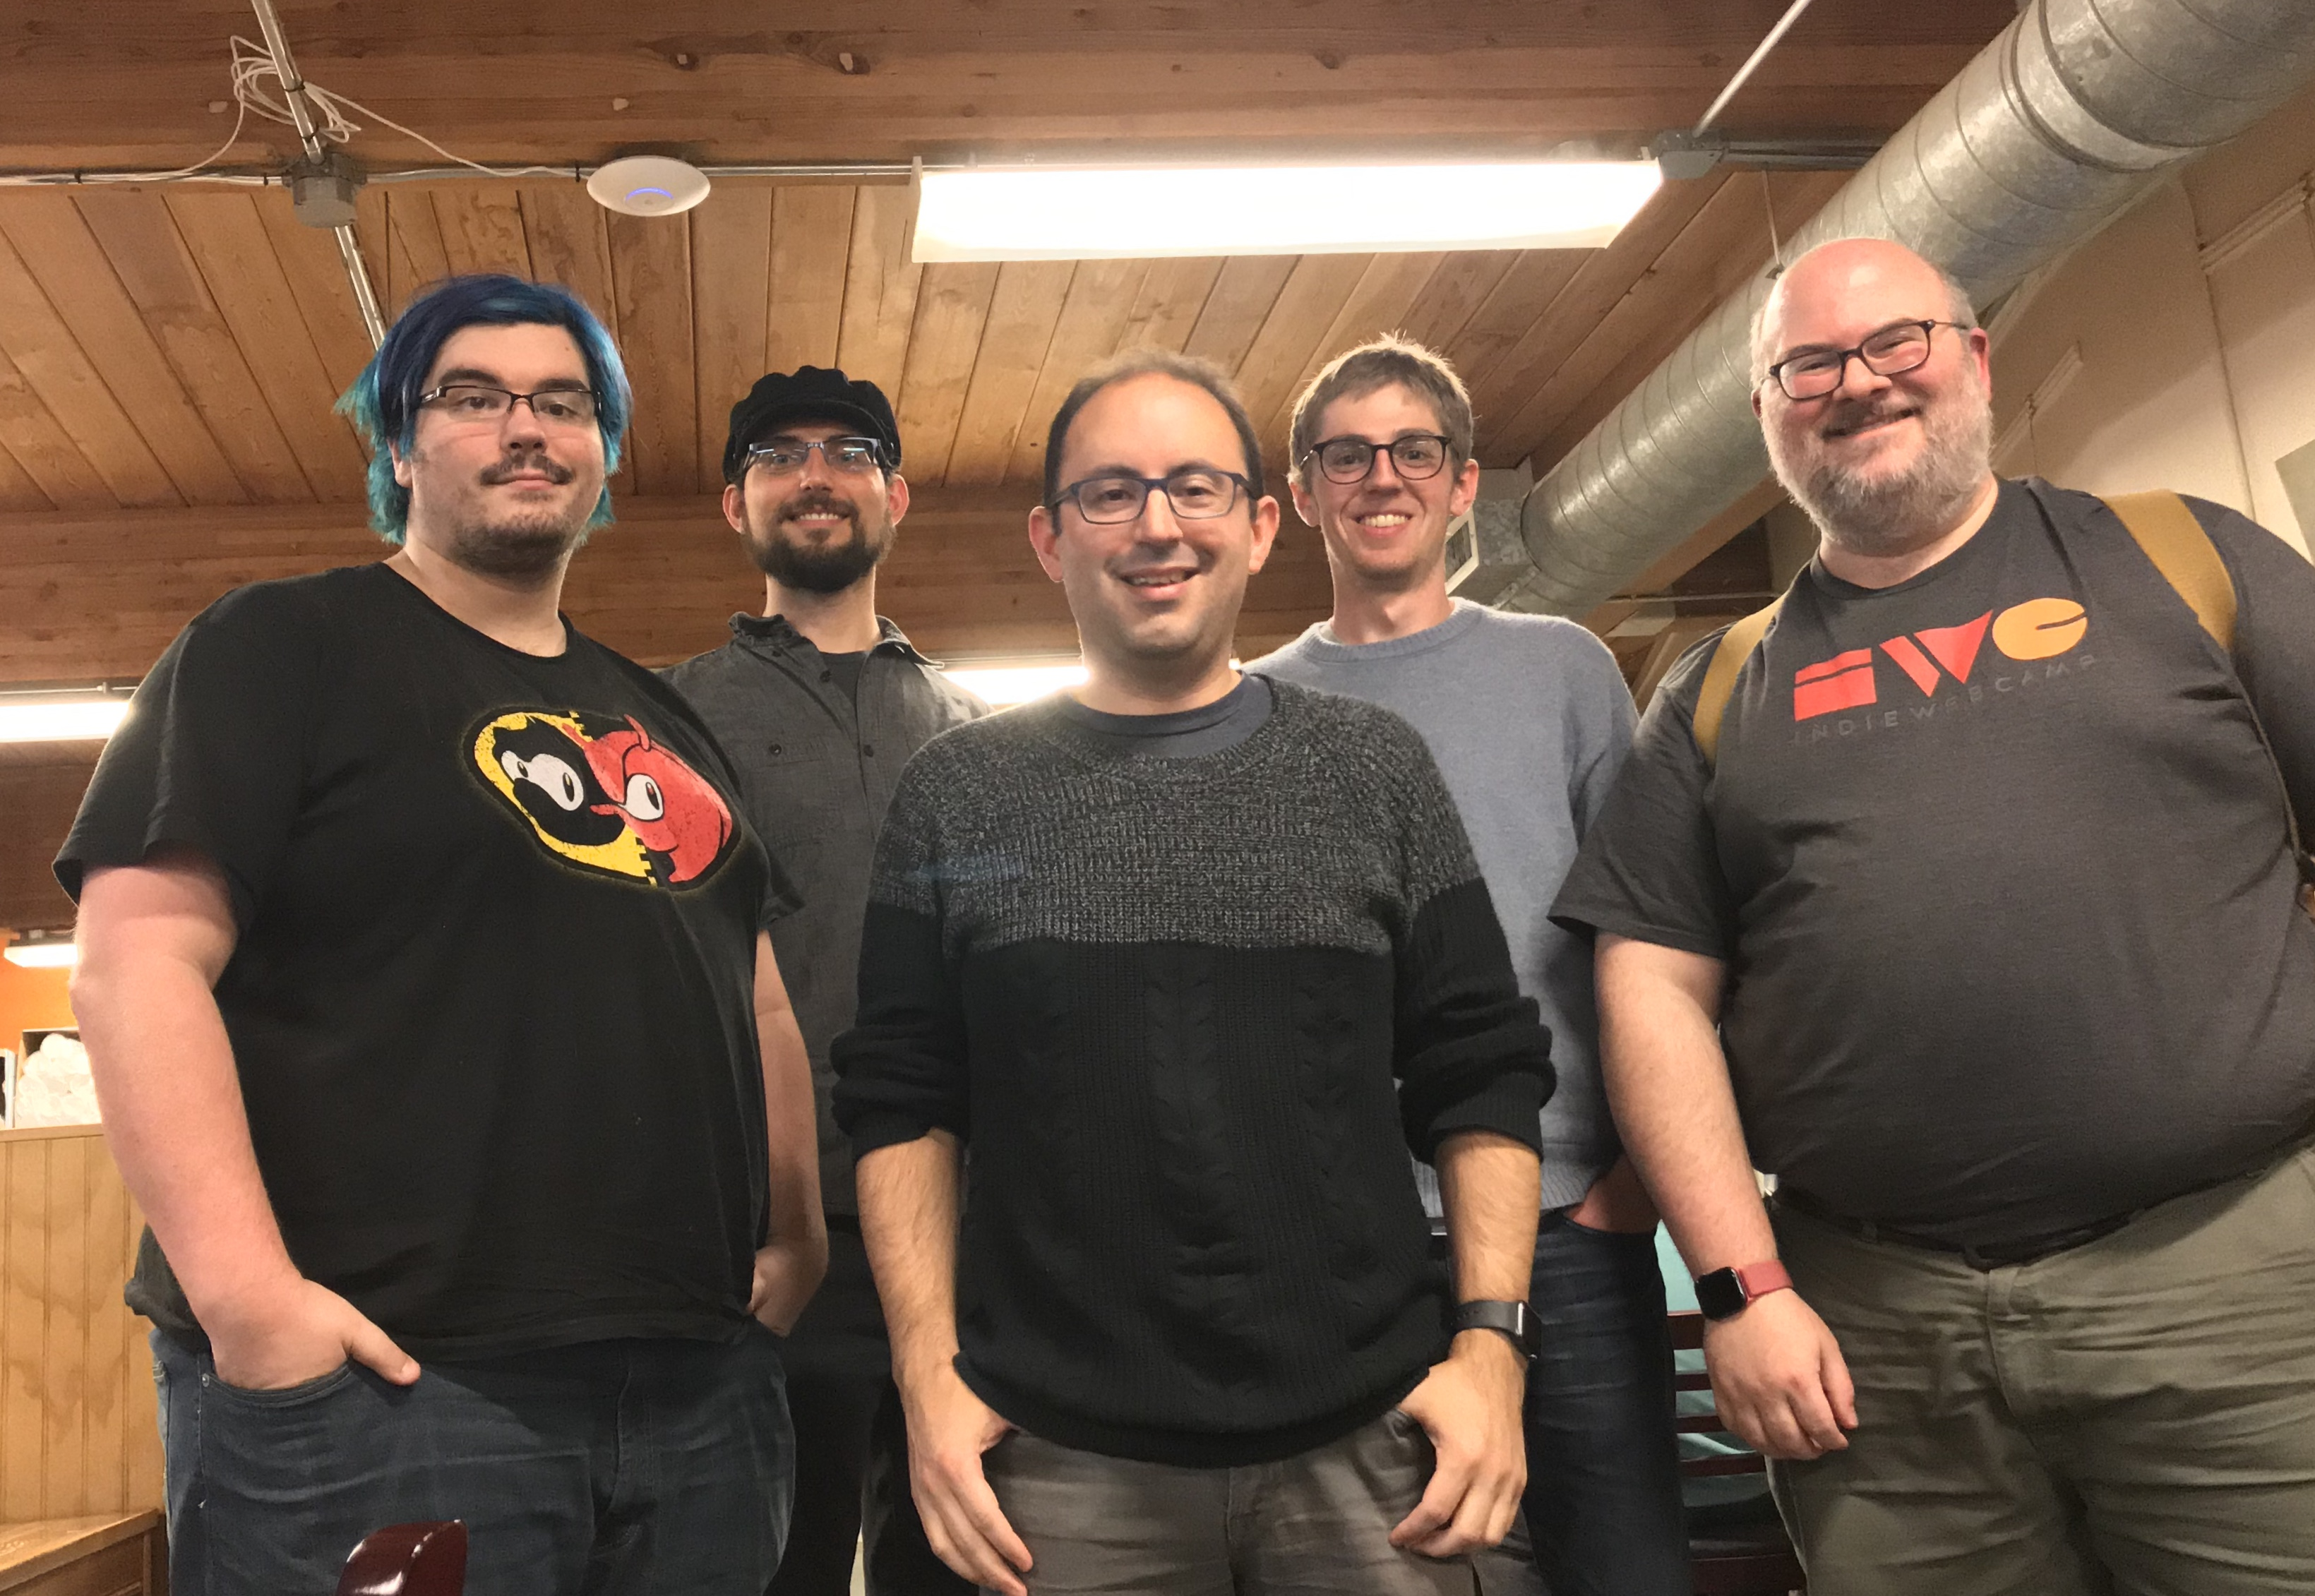 Steve, Tim, David, Cody, Doug inside the Wayward Coffeehouse for HWC Seattle